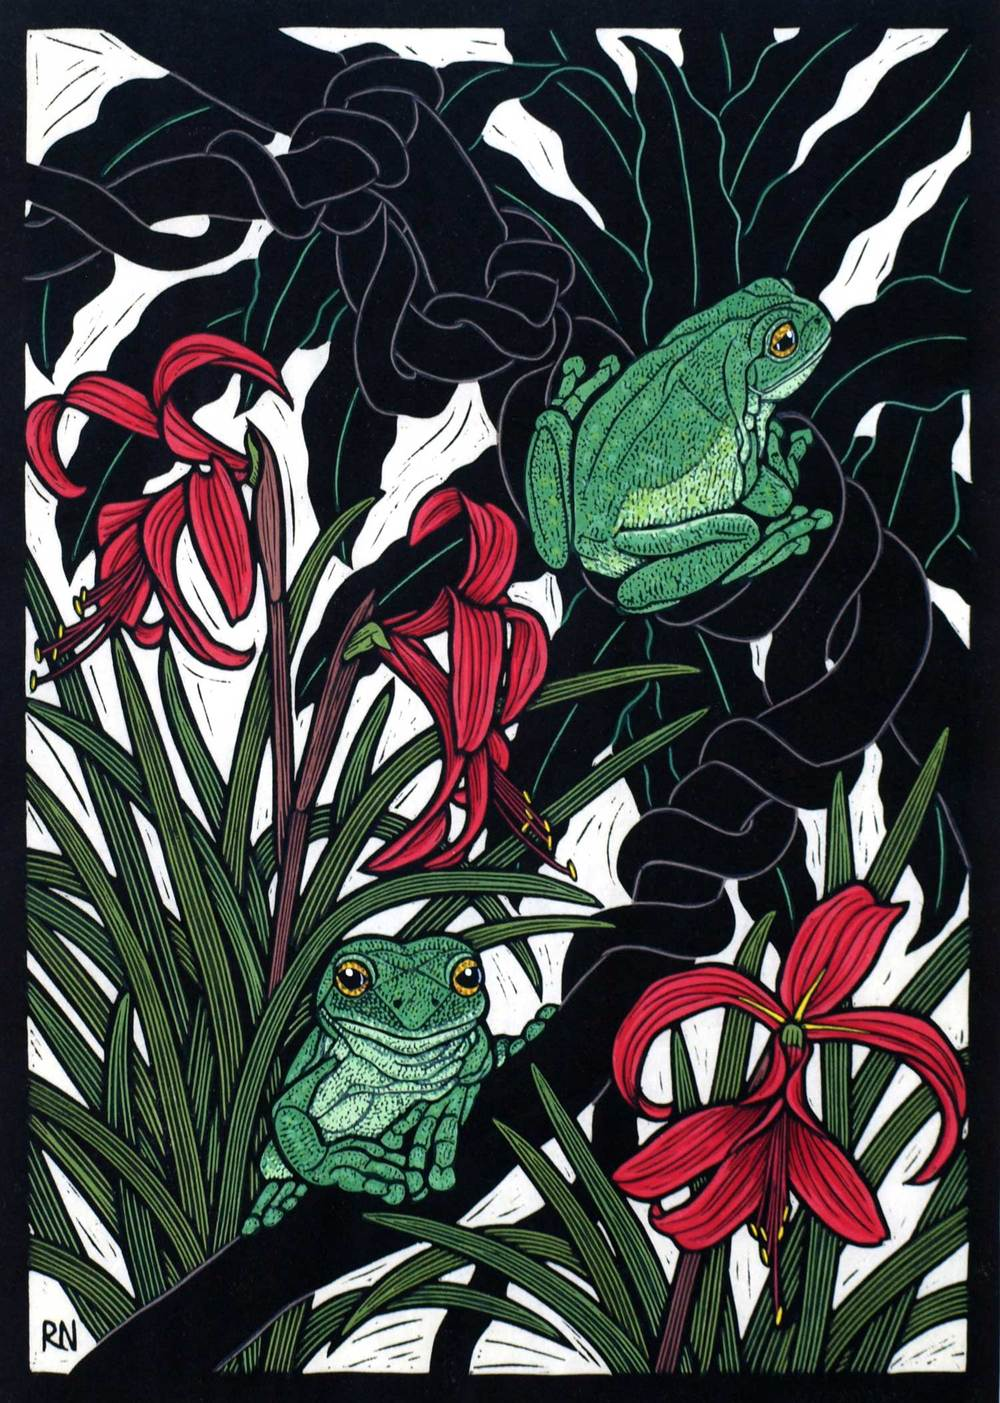 green-tree-frog-linocut-rachel-newling.jpg